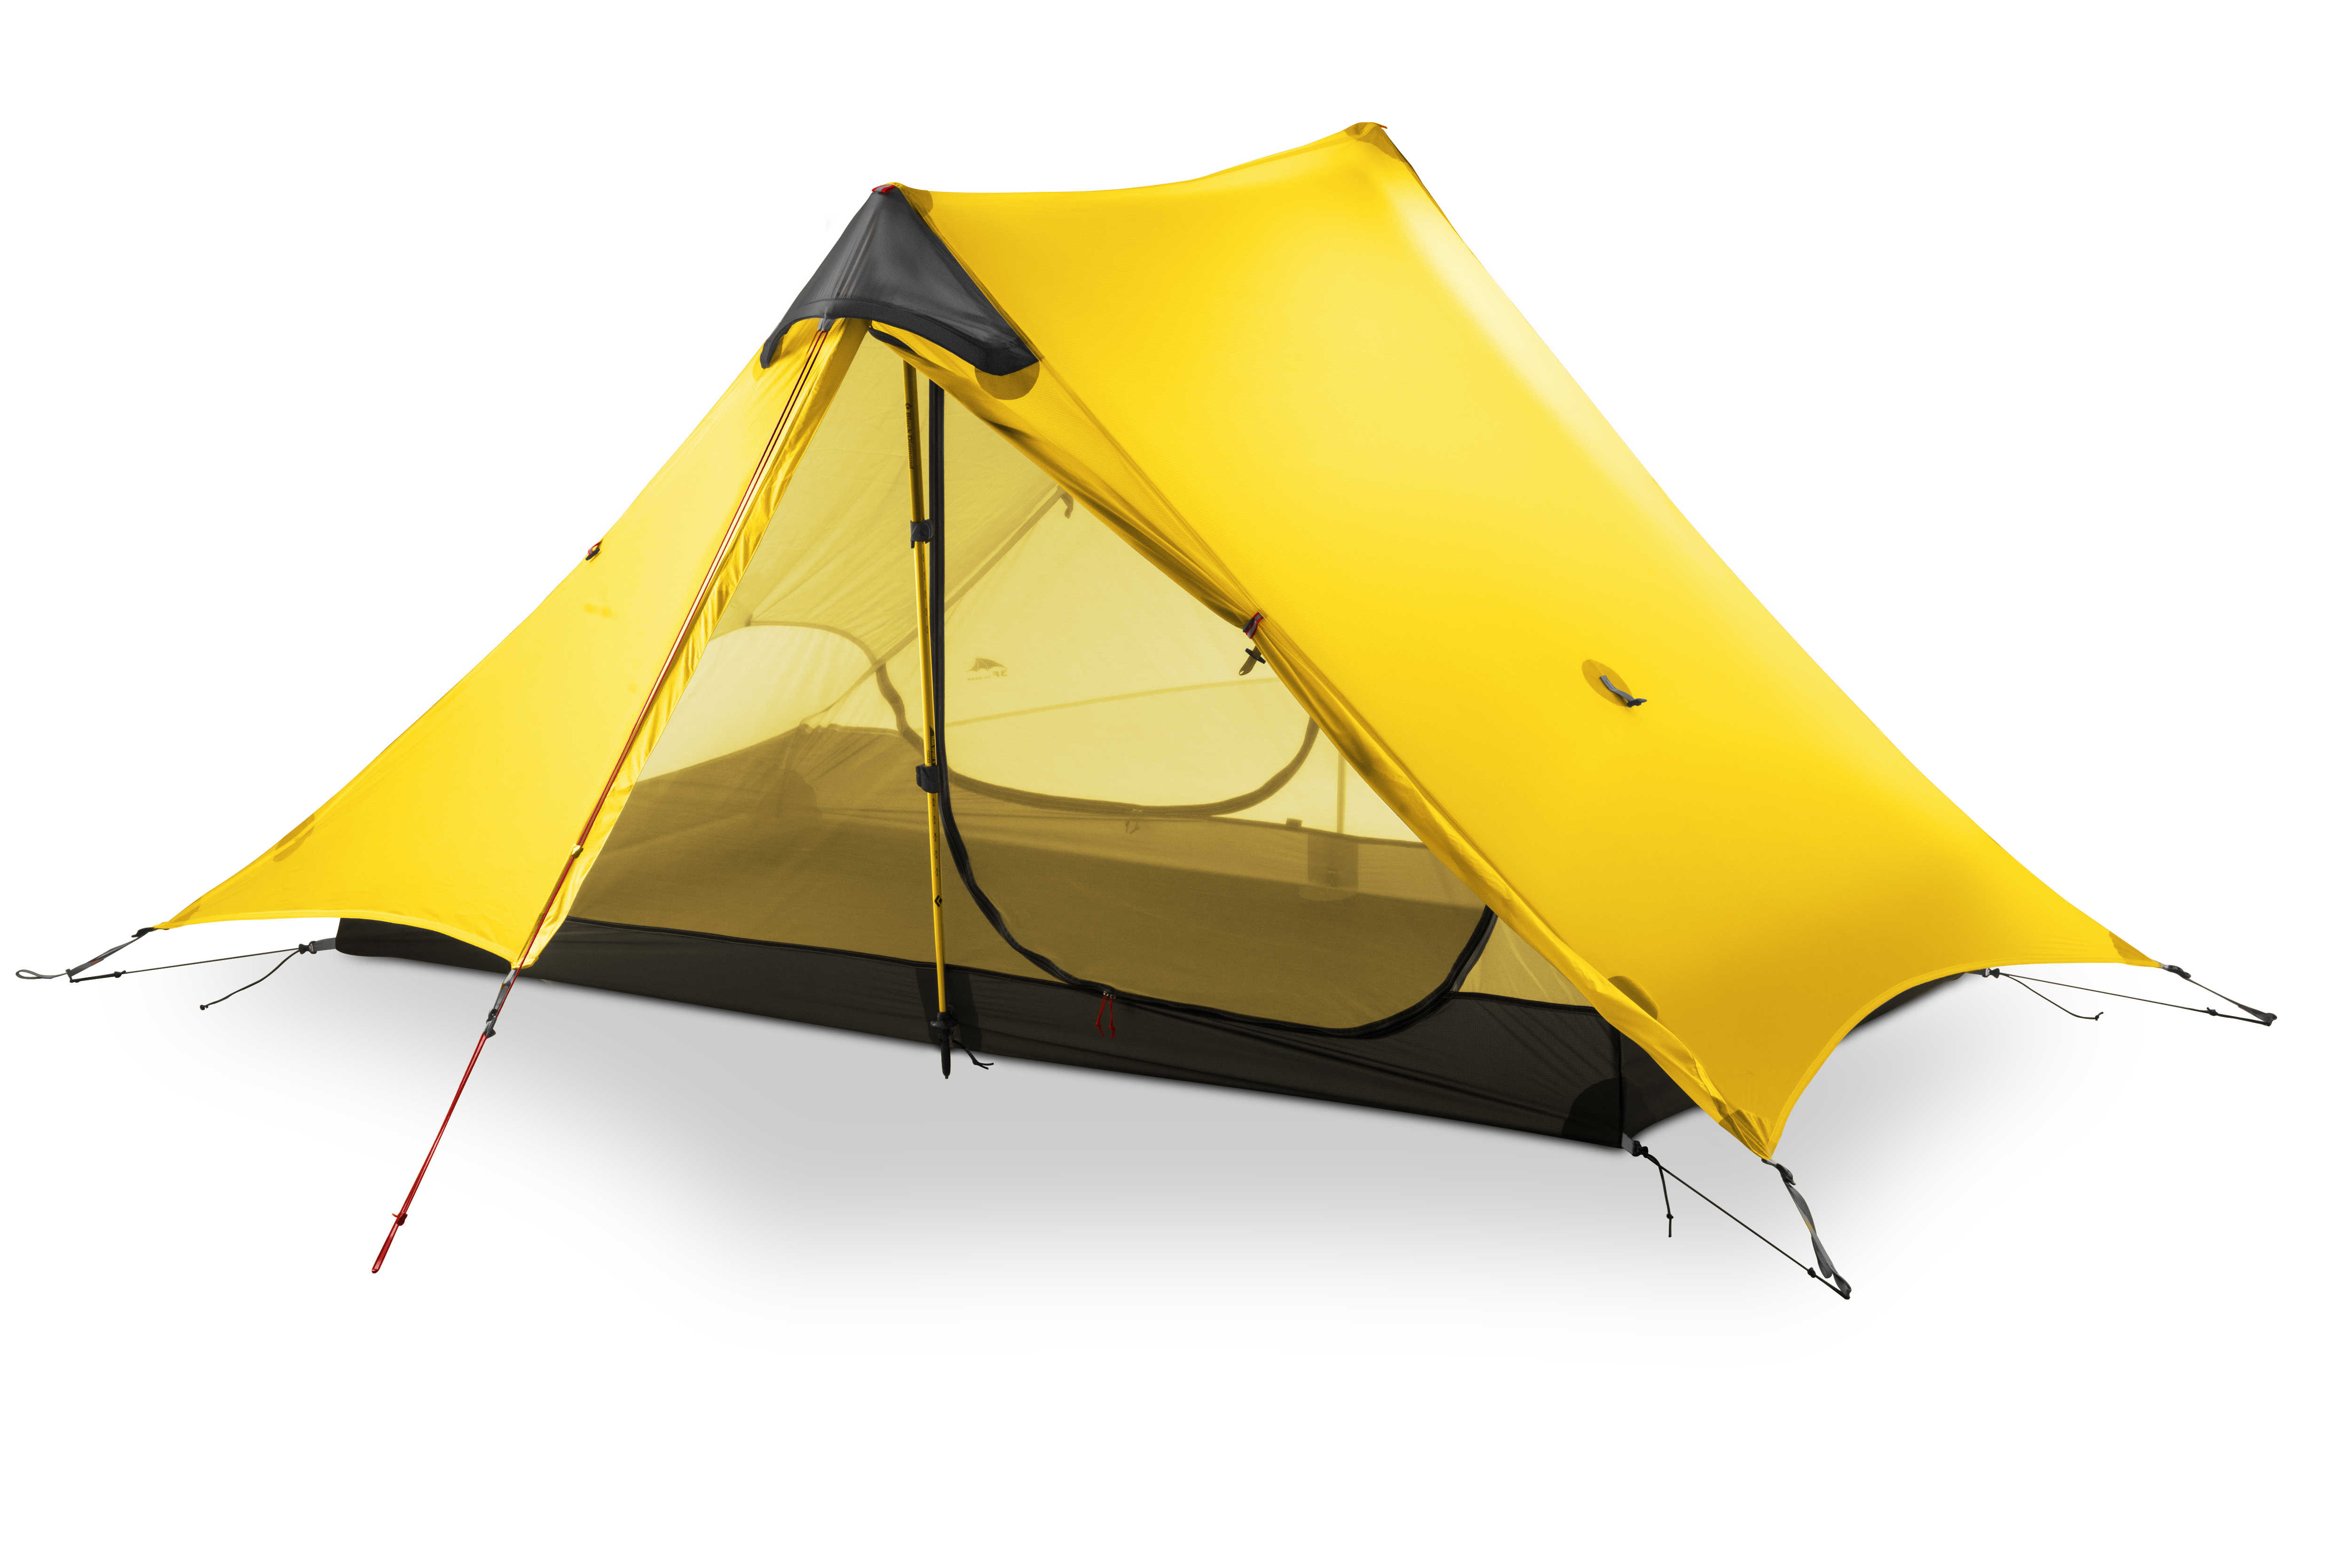 3F ULเกียร์ 2019 Lanshan 2 Rodlessเต็นท์ 2 คนProfessional 15D Silnylonเต็นท์Oudoor Ultralight Campingเต็นท์ 3 4 เต็นท์